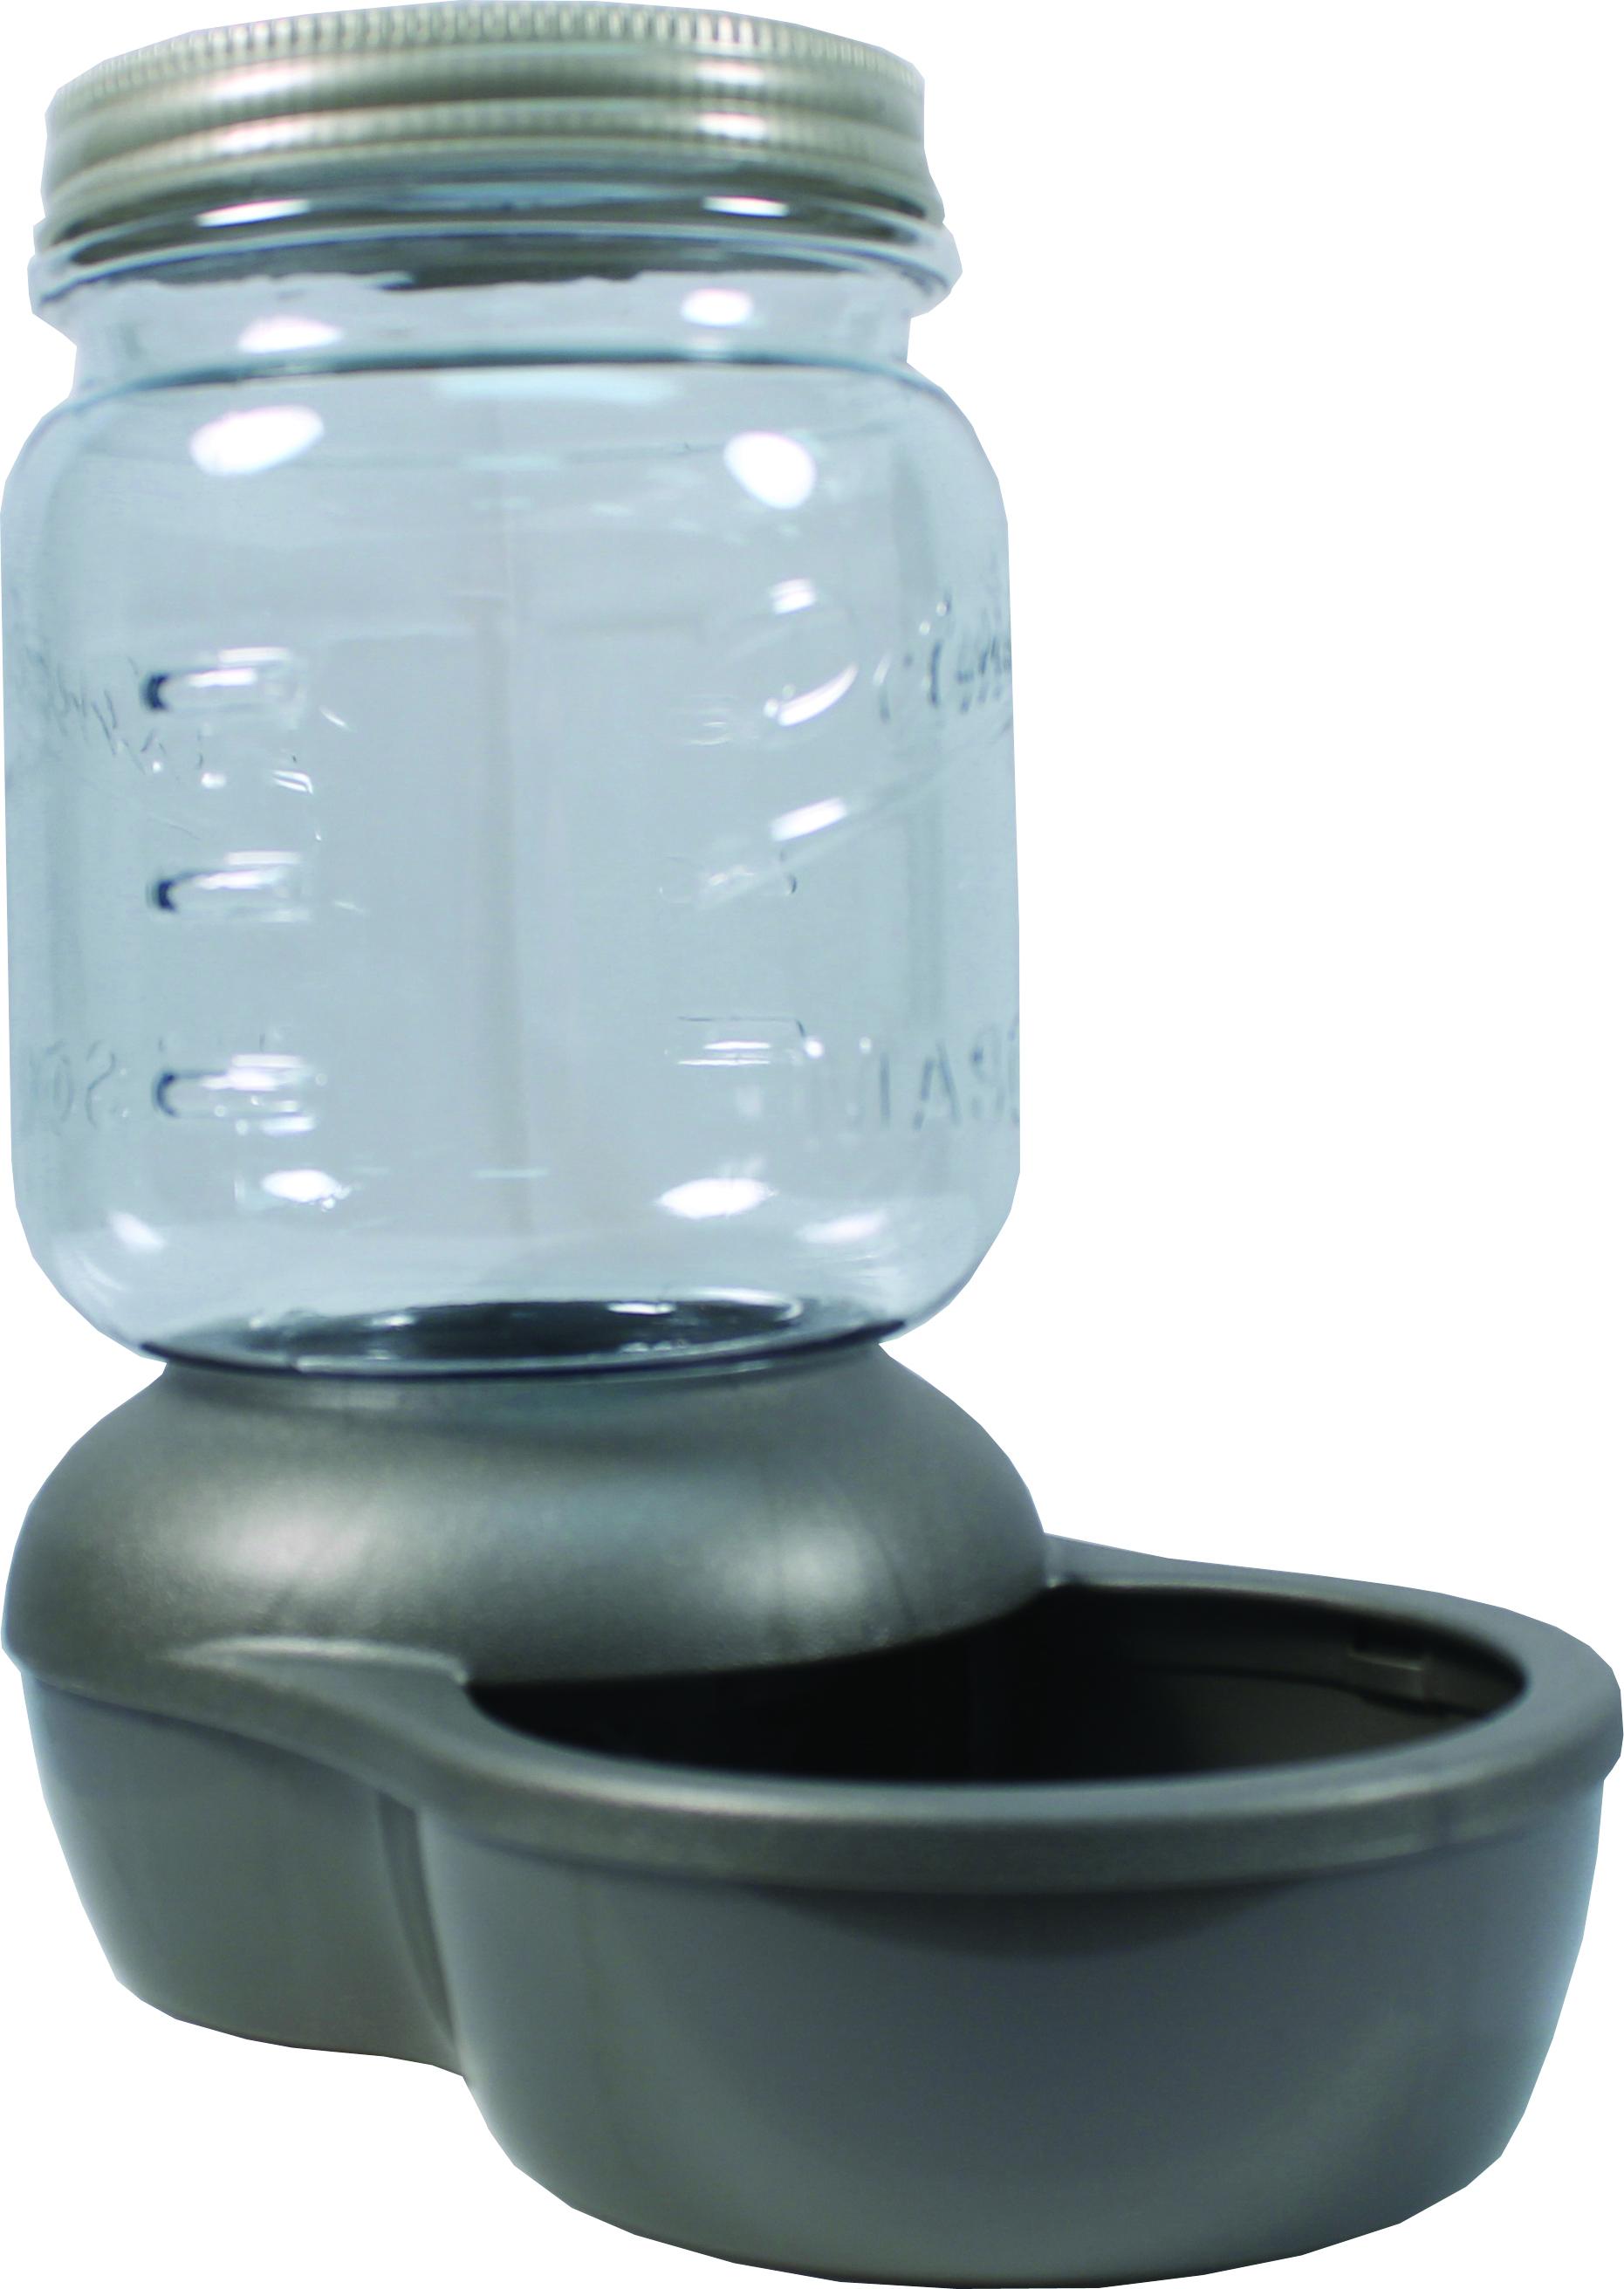 Petmate Mason Jar Replendish Filtered Waterer